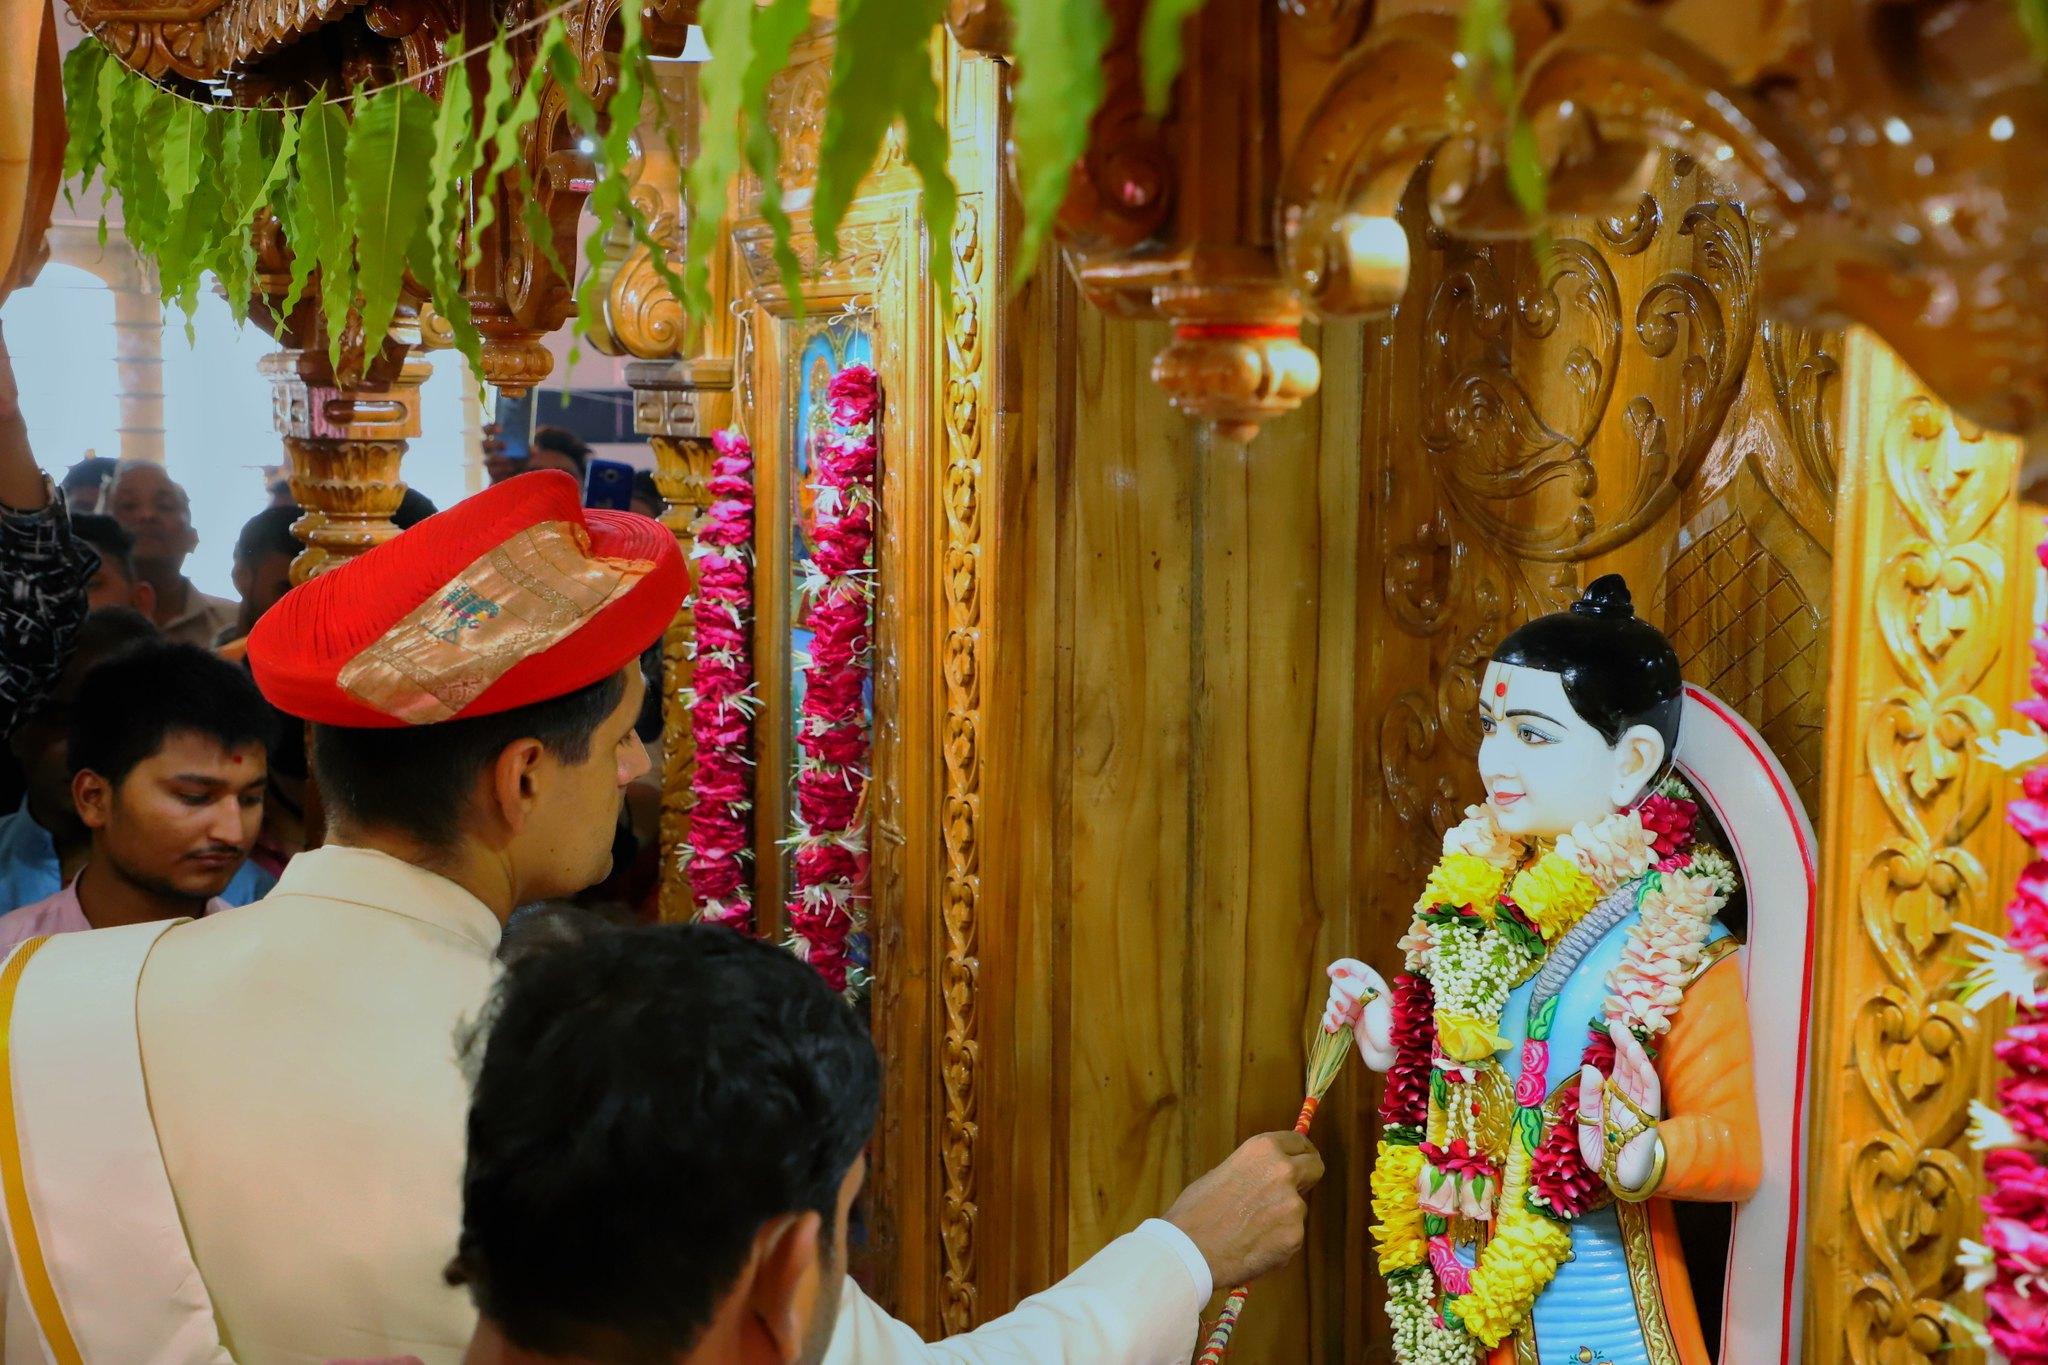 Murti Prathishta Ladies Mandir - Lunawada Mandir